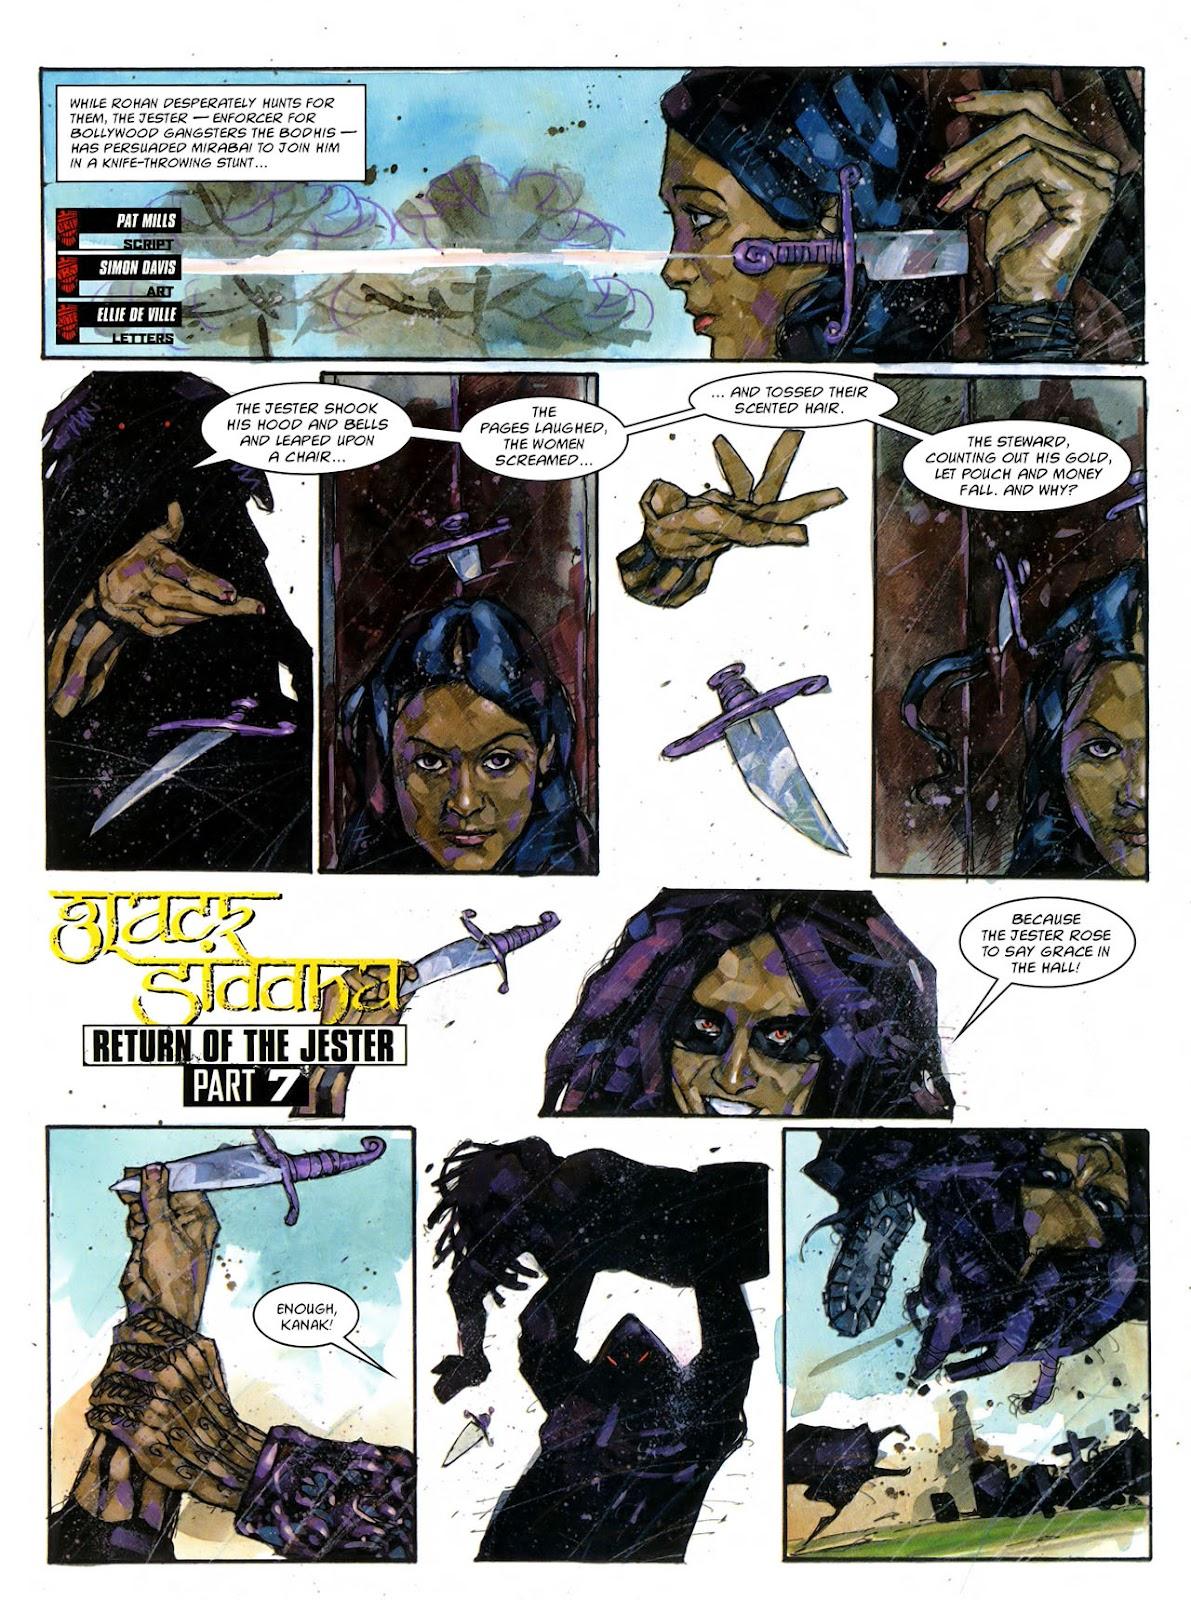 Comic Judge Dredd Megazine (Vol  5) issue 51